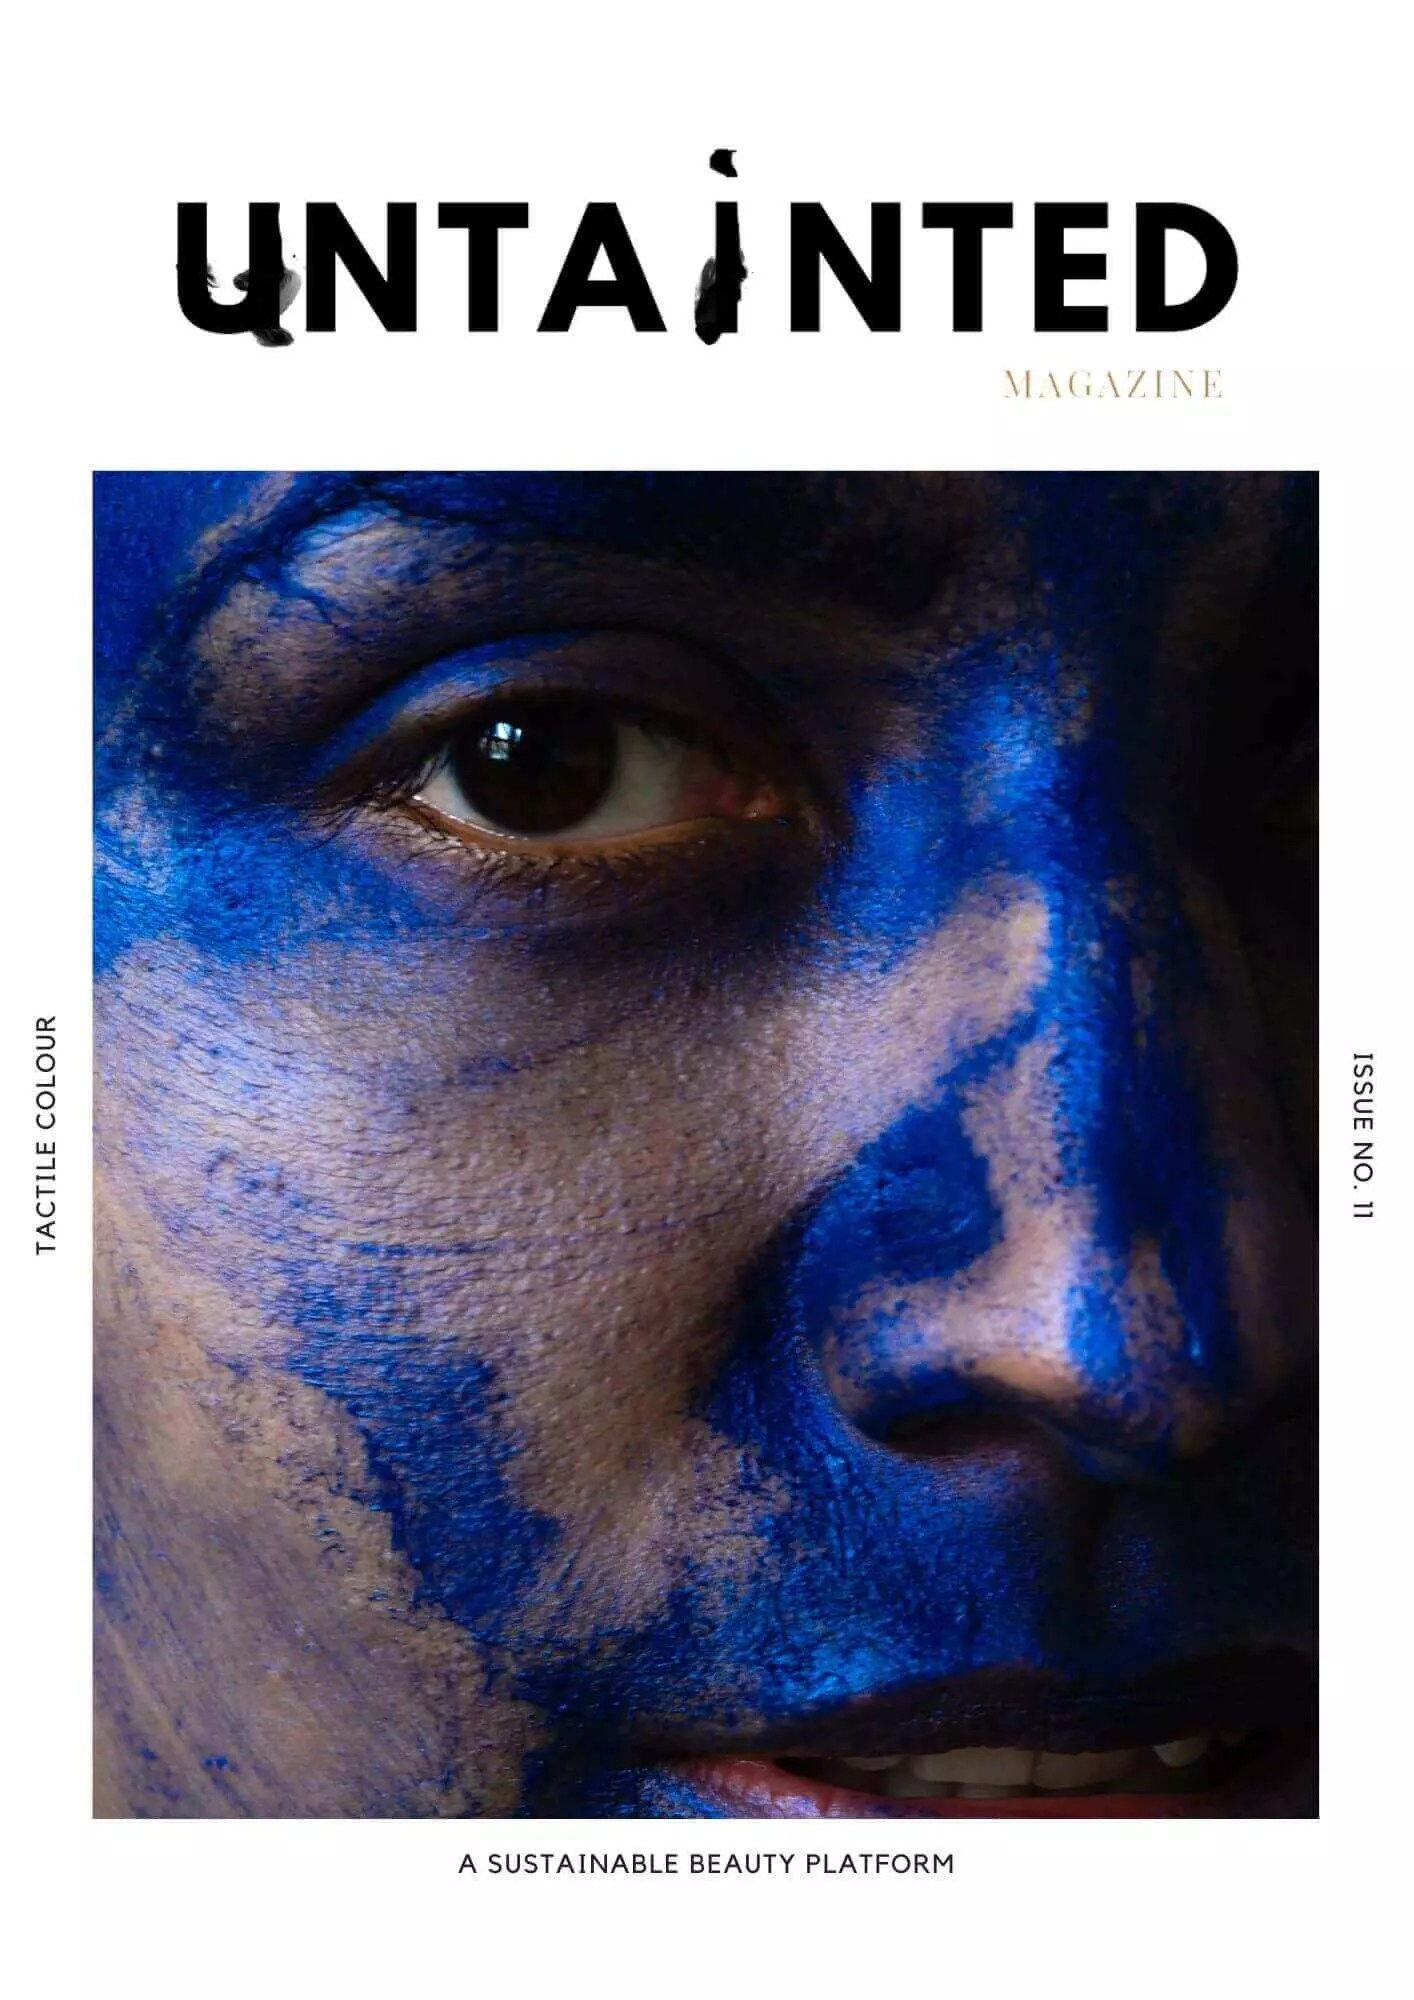 Untainted Magazine